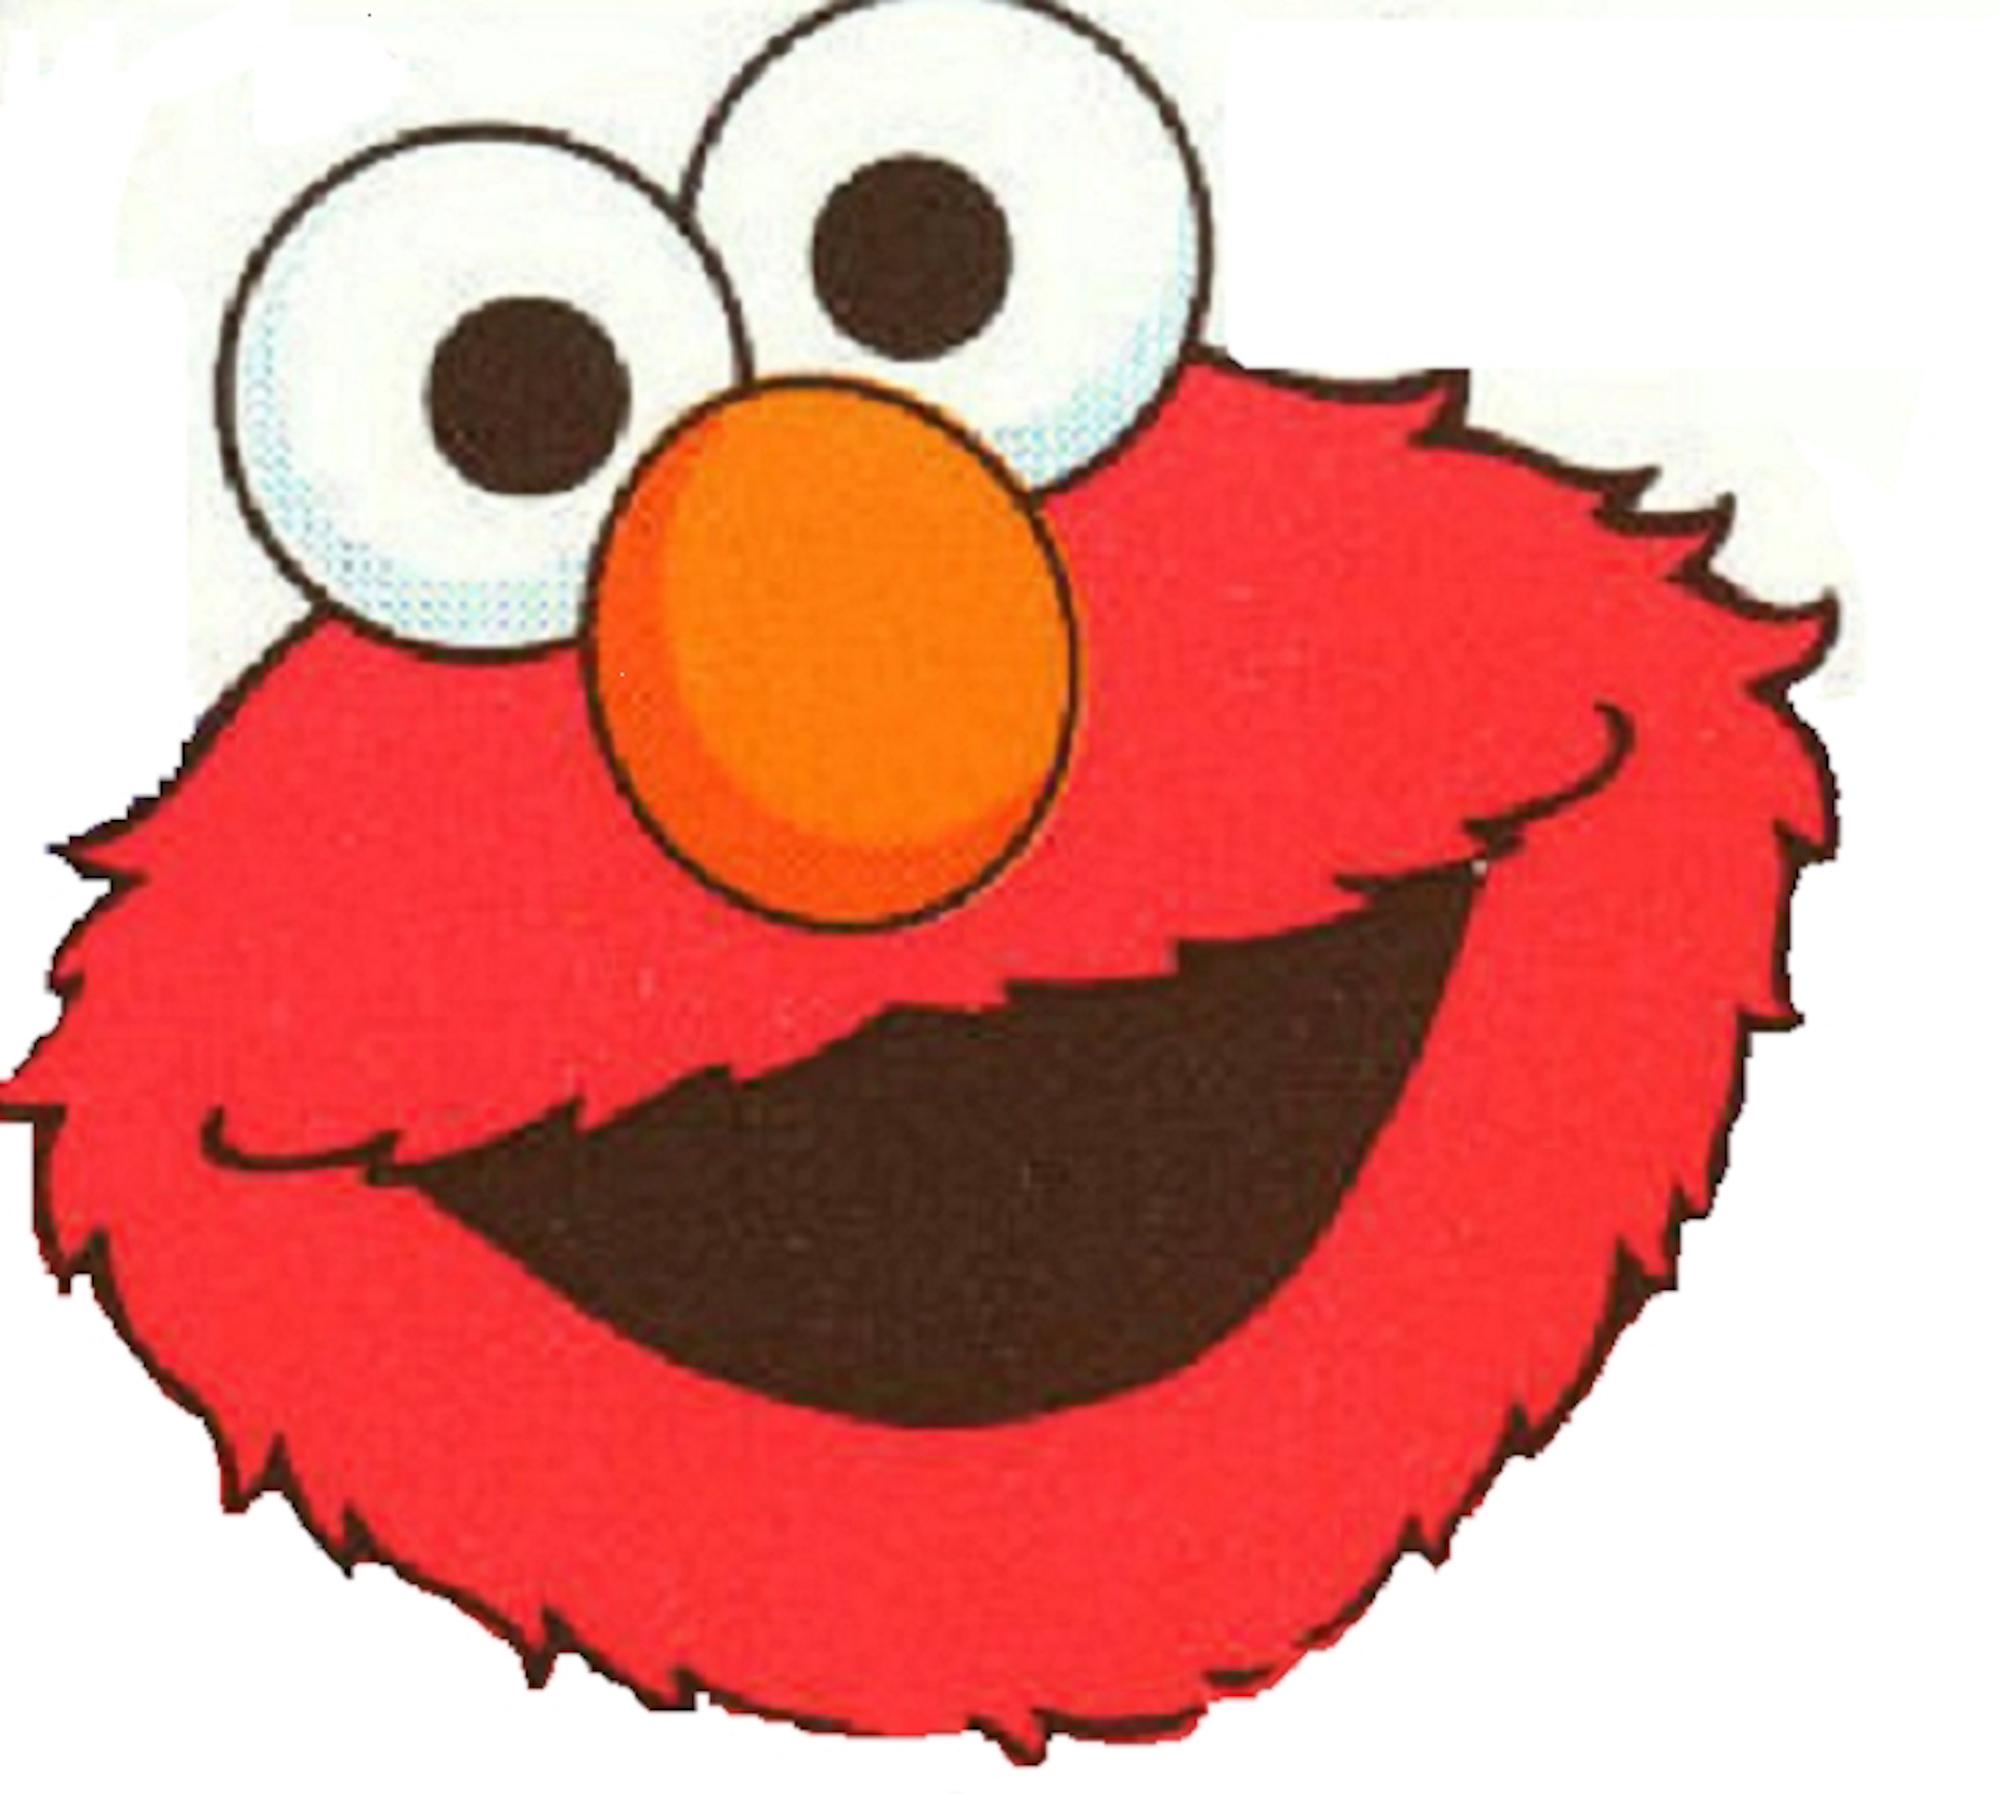 Elmo Clipart Clipart Panda Free Clipart Images #TZwuI5 - Clipart Kid